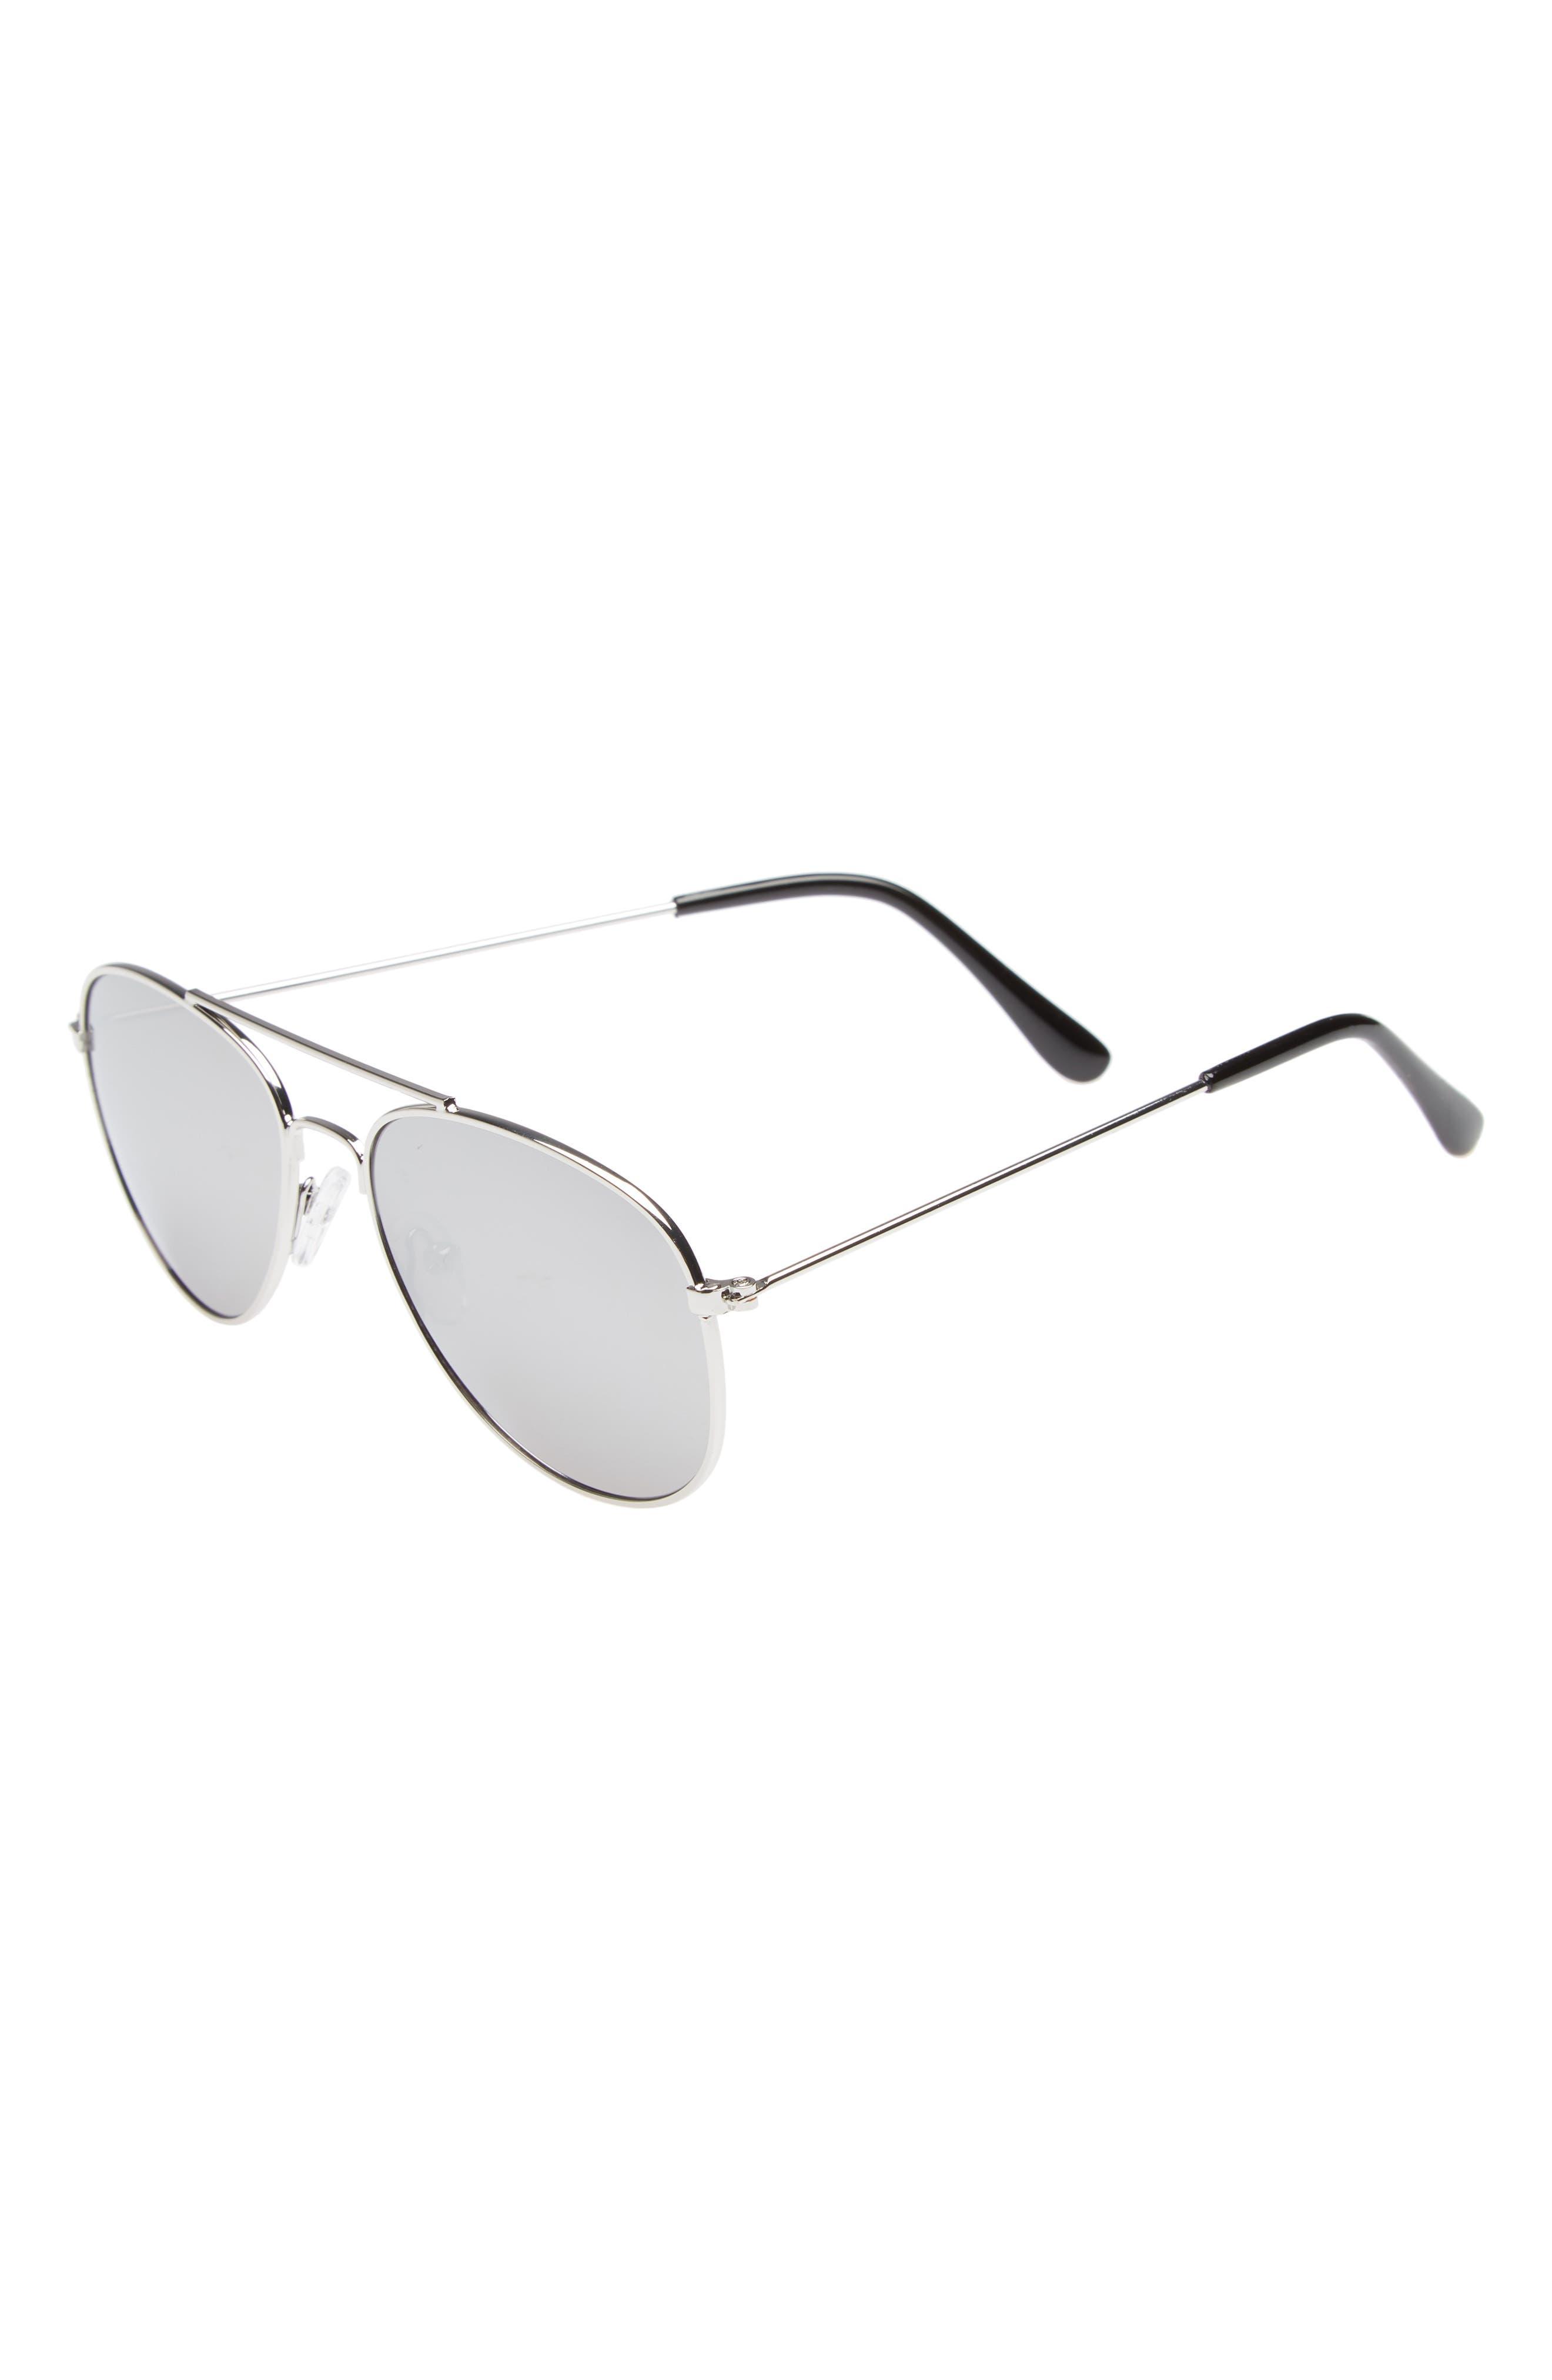 50mm Mirrored Aviator Sunglasses,                             Main thumbnail 1, color,                             SILVER COMBO